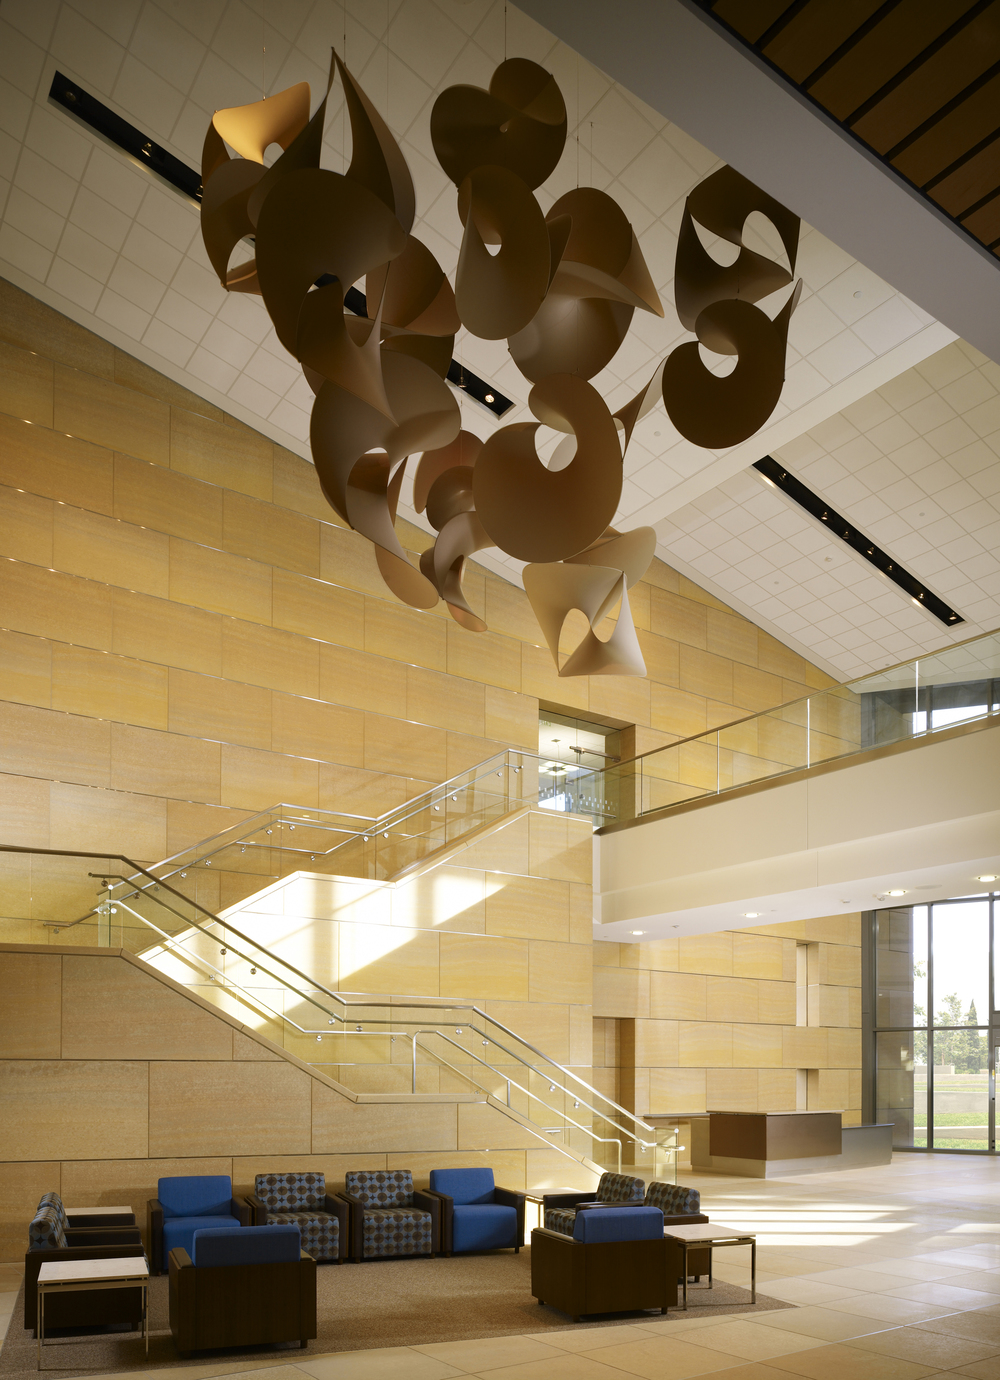 UCIrvine Douglas Hospital Interior - Lobby 01.jpg